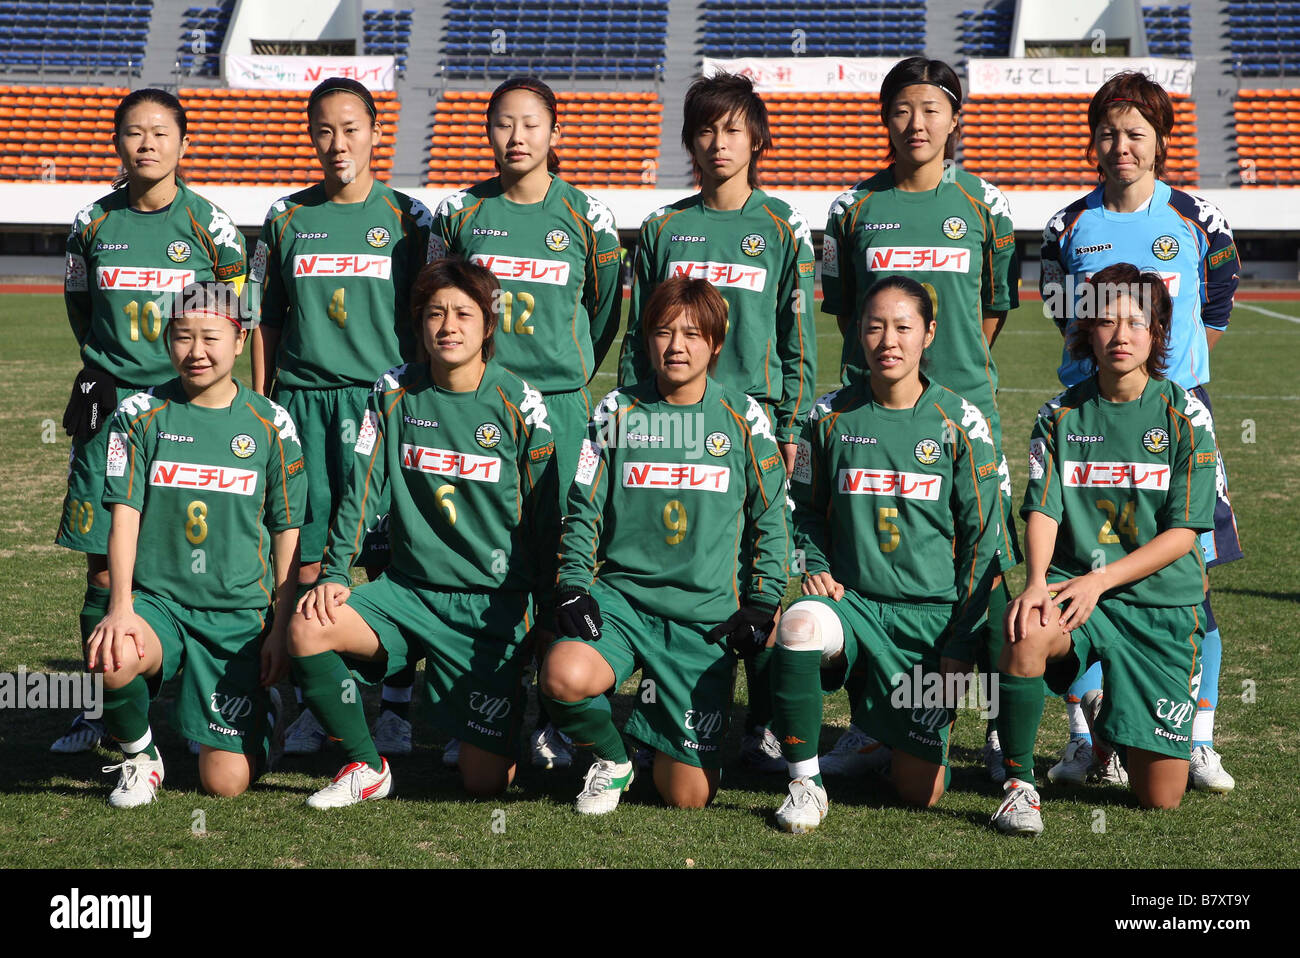 ú e E x U NTV Beleza team group line up NOVEMBER 23 2008 Football 2008 NADESHIKO League Division 1 between - Stock Image